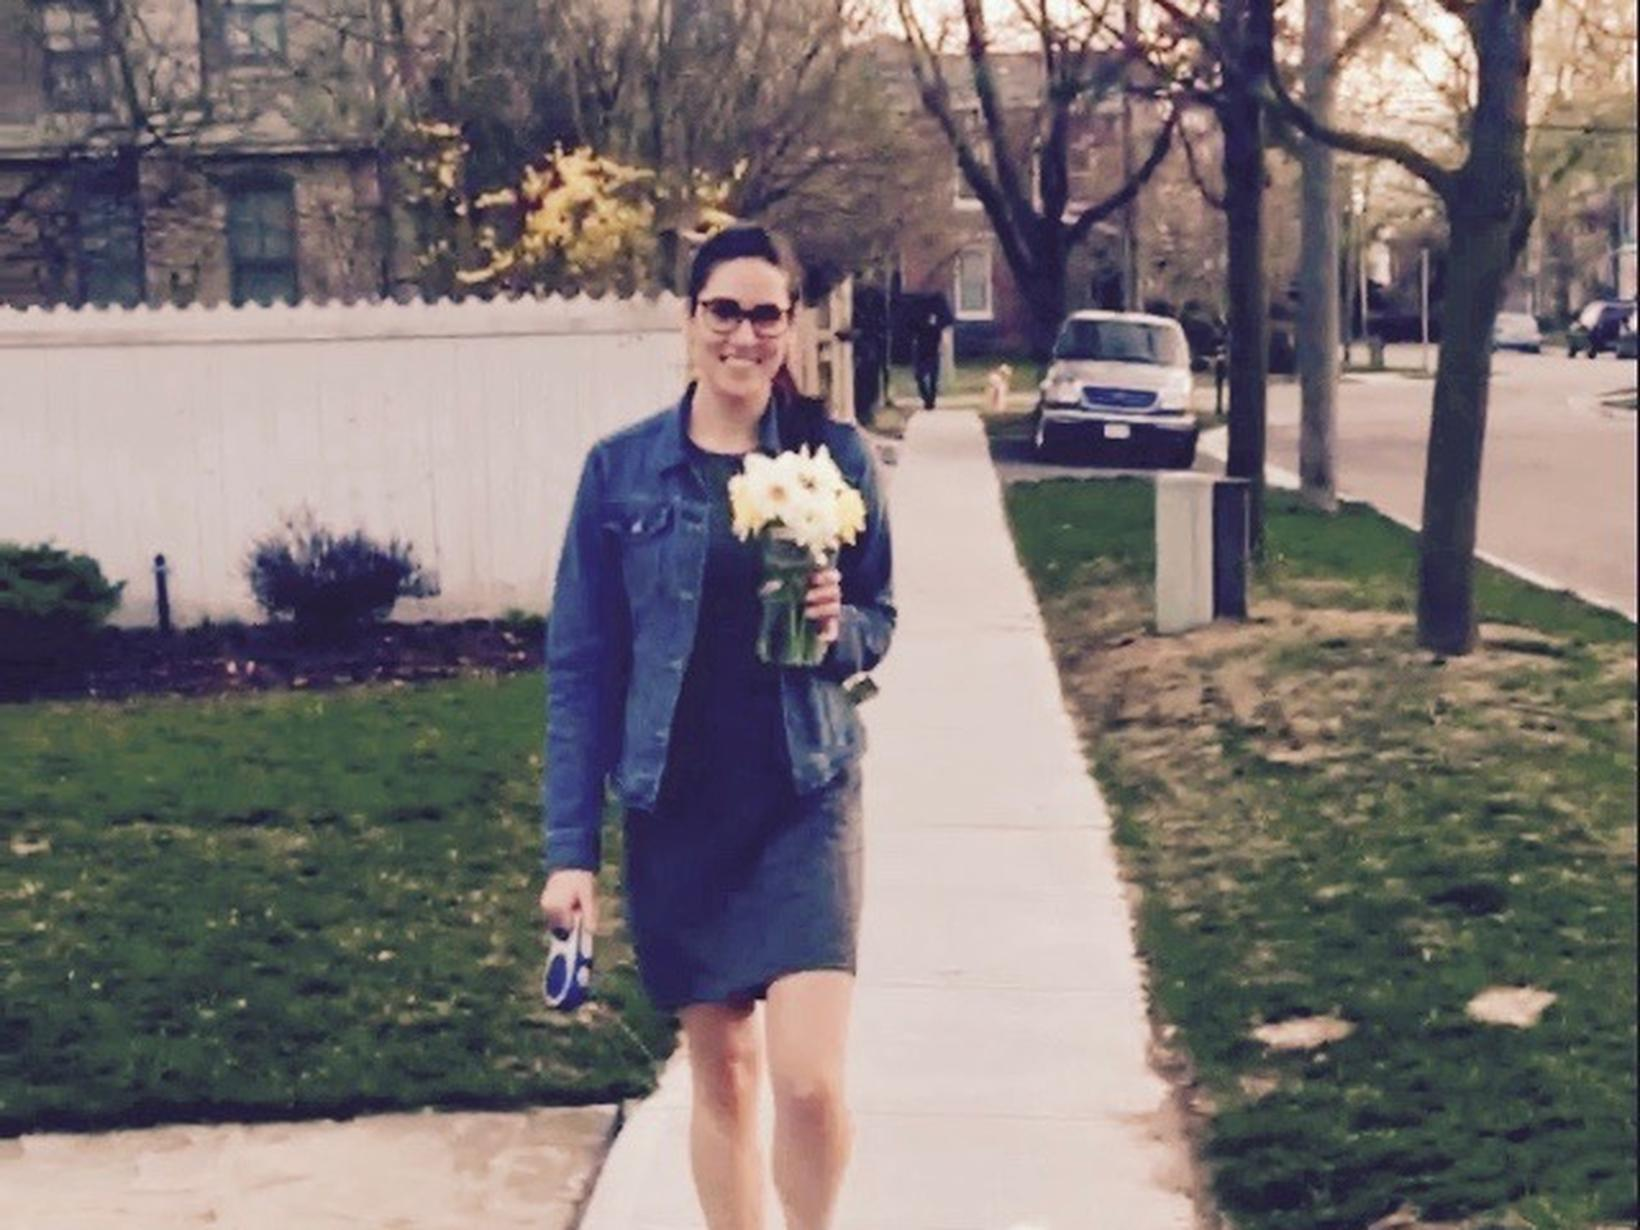 Claudia from Toronto, Ontario, Canada